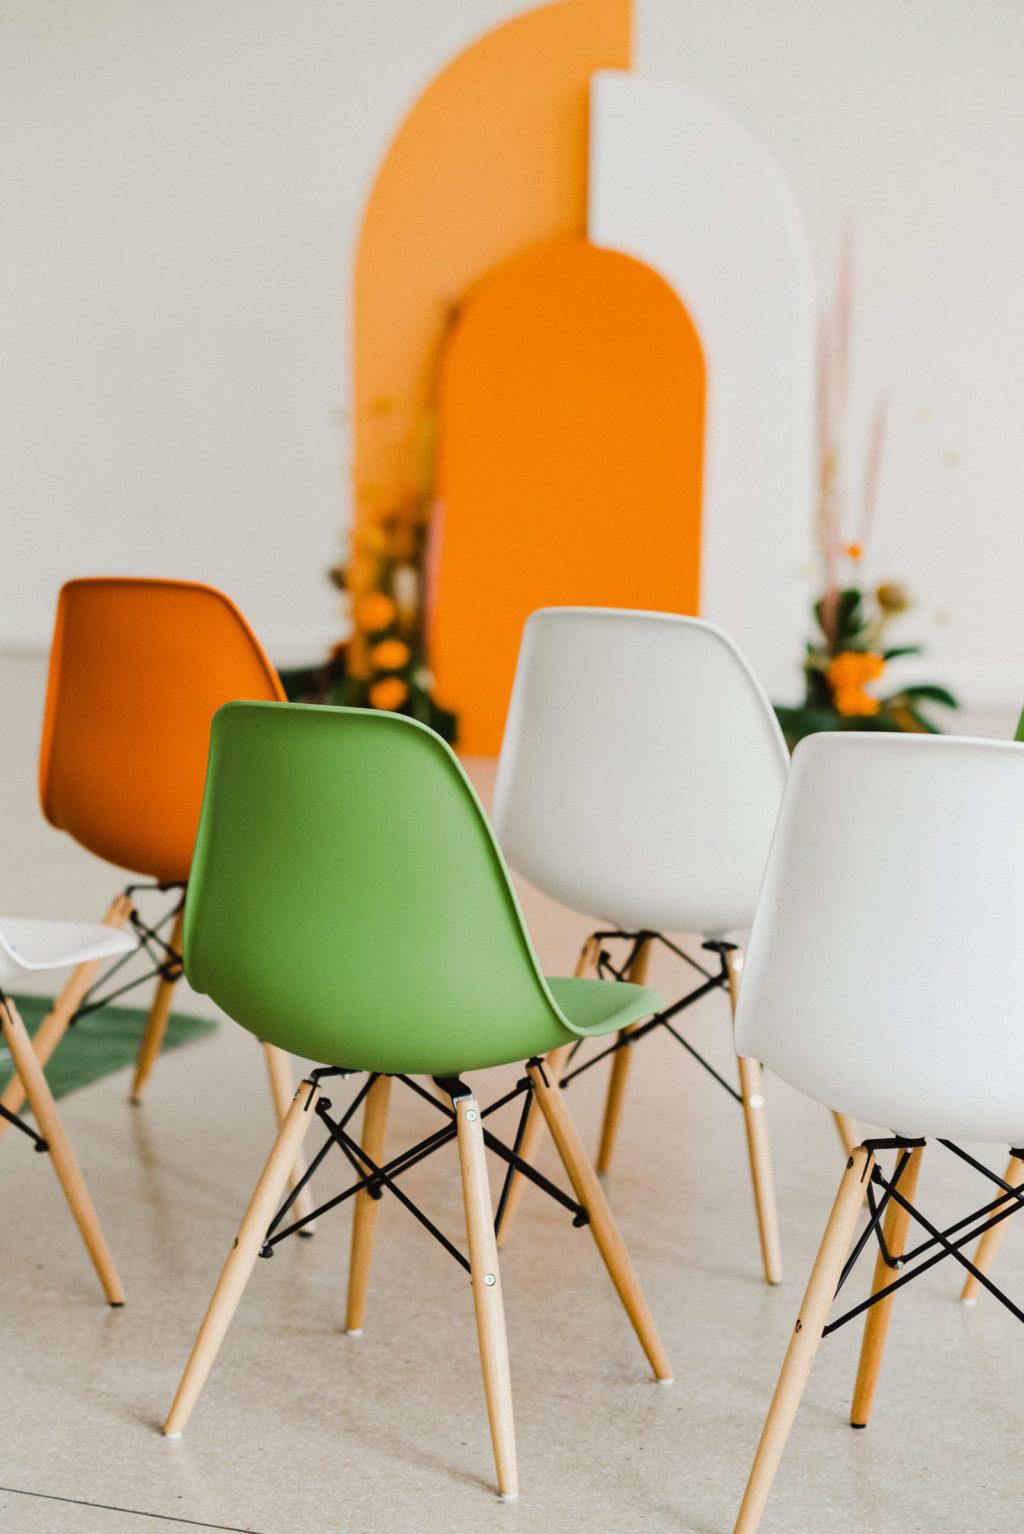 Vibrant Retro Mid Century Modern Wedding Ceremony Decor, Green, White and Orange Eames Chairs